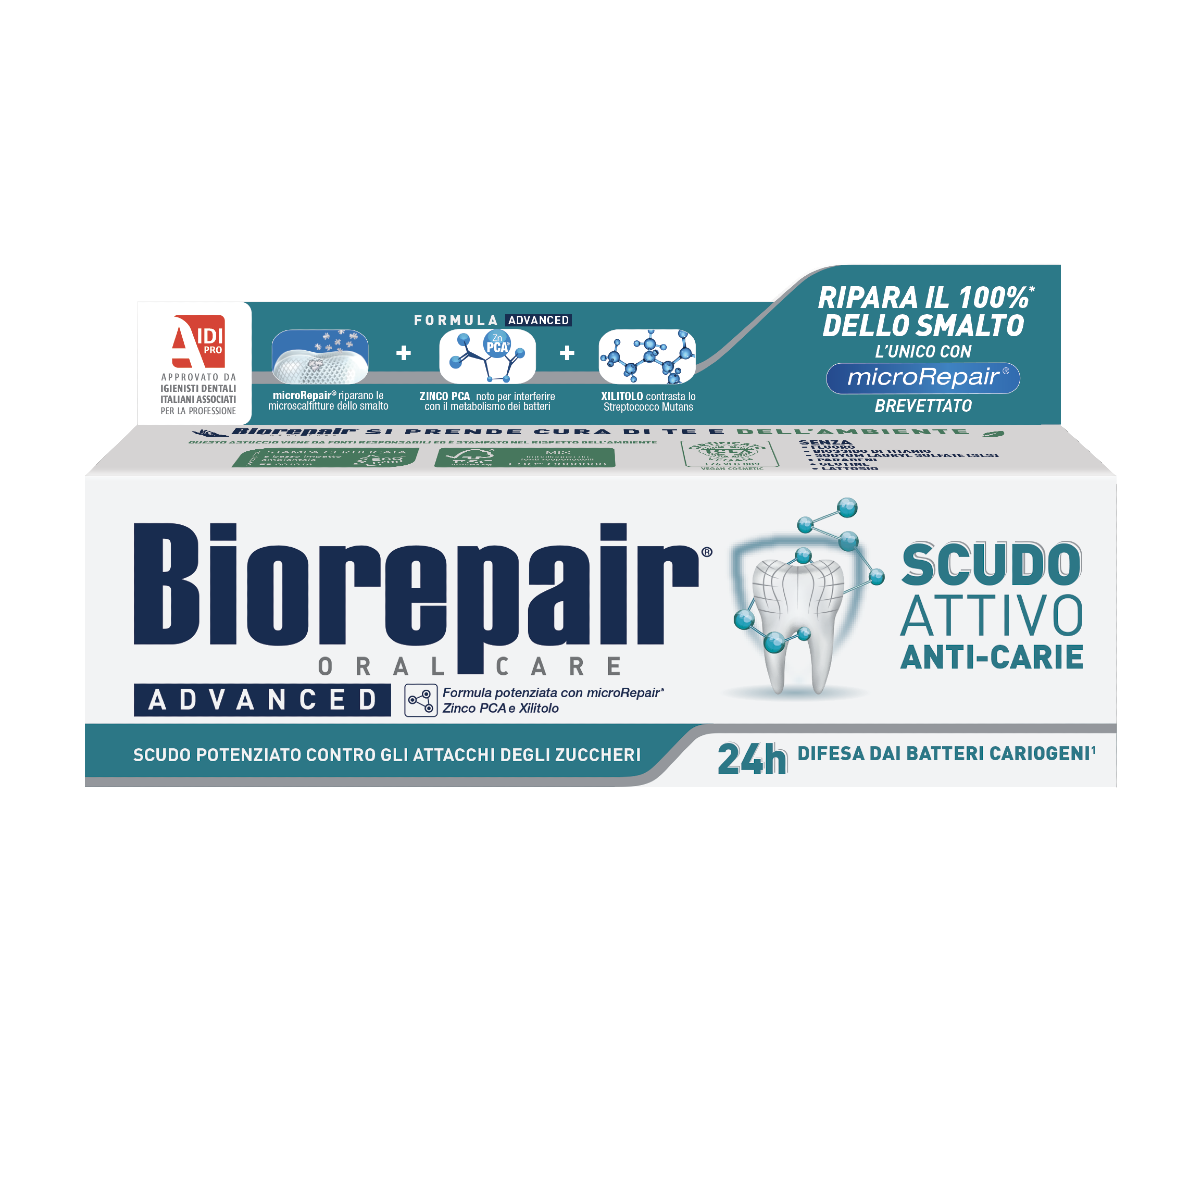 Biorepair® ADVANCED Scudo Attivo Anti-carie